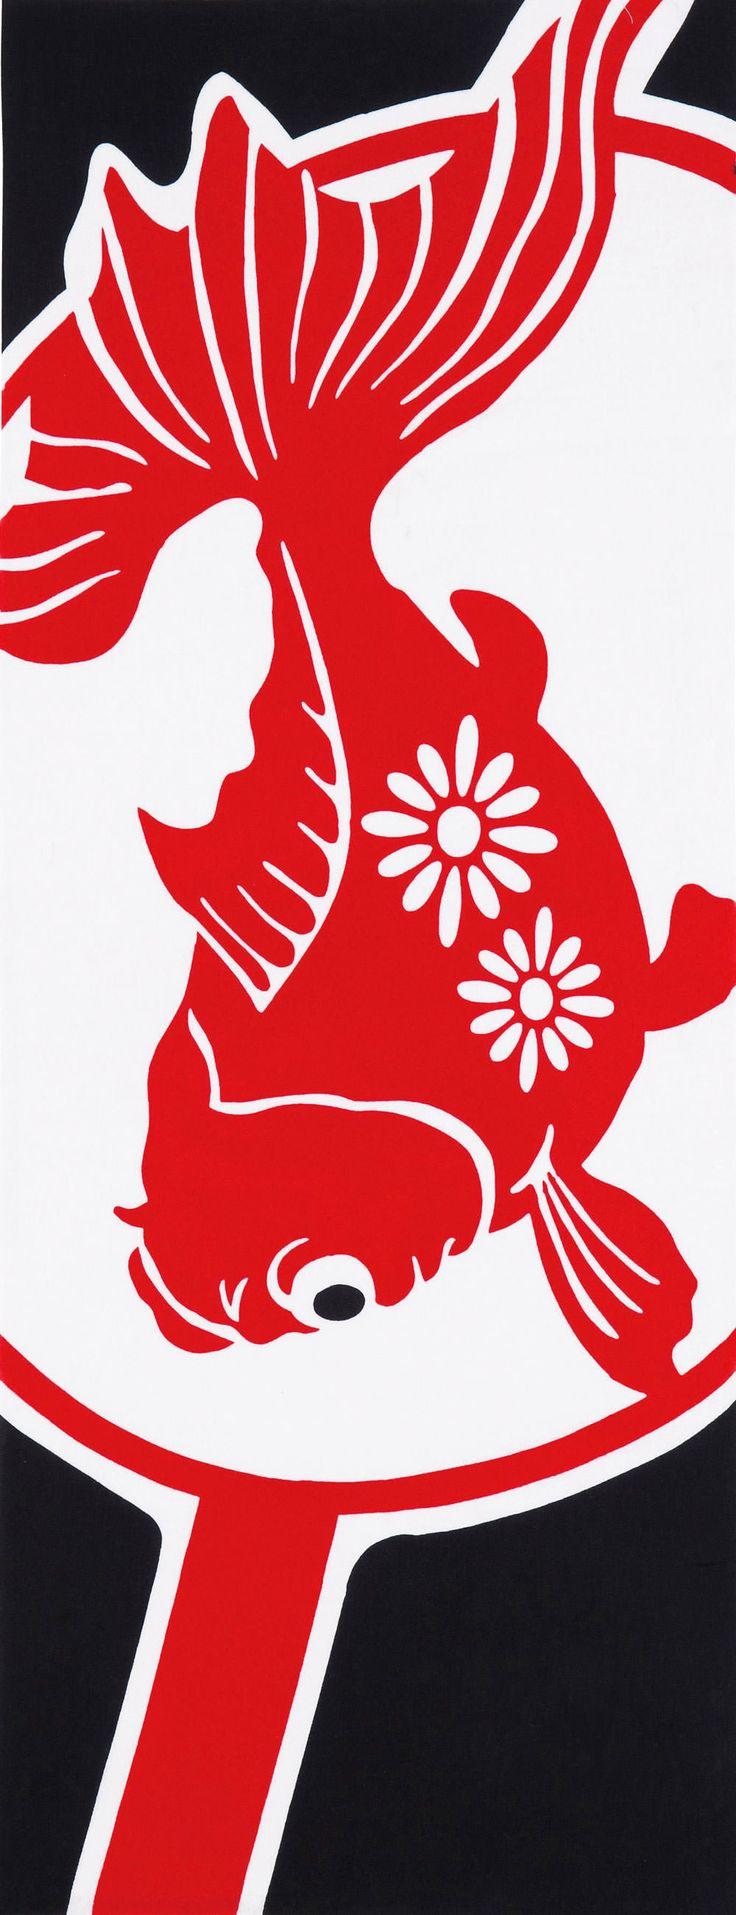 76 best Golfish images on Pinterest | Watercolor fish, Goldfish ...